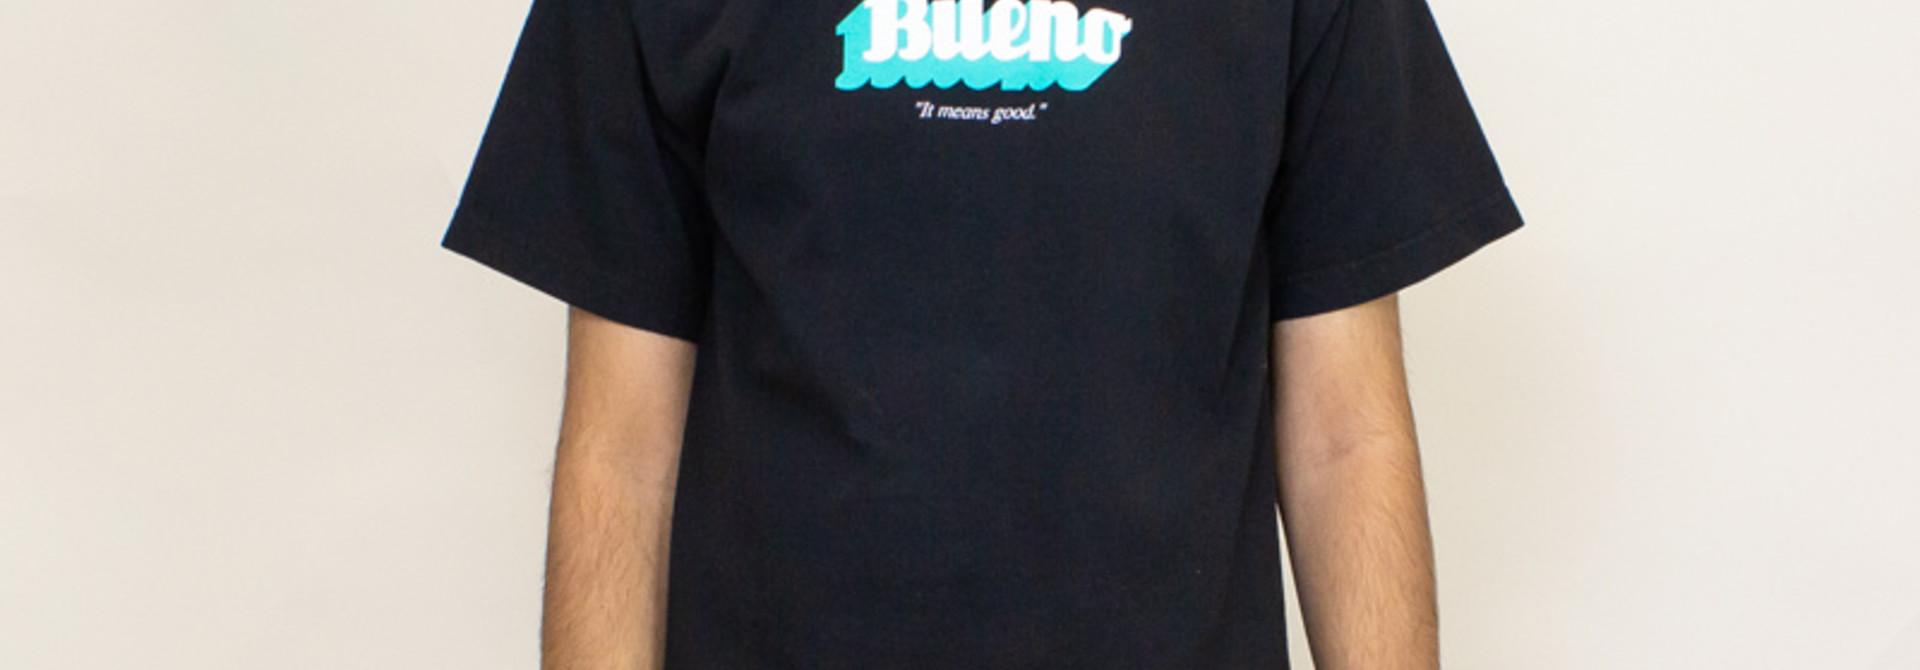 It Means Good Classic Bueno Logo Tee - Black